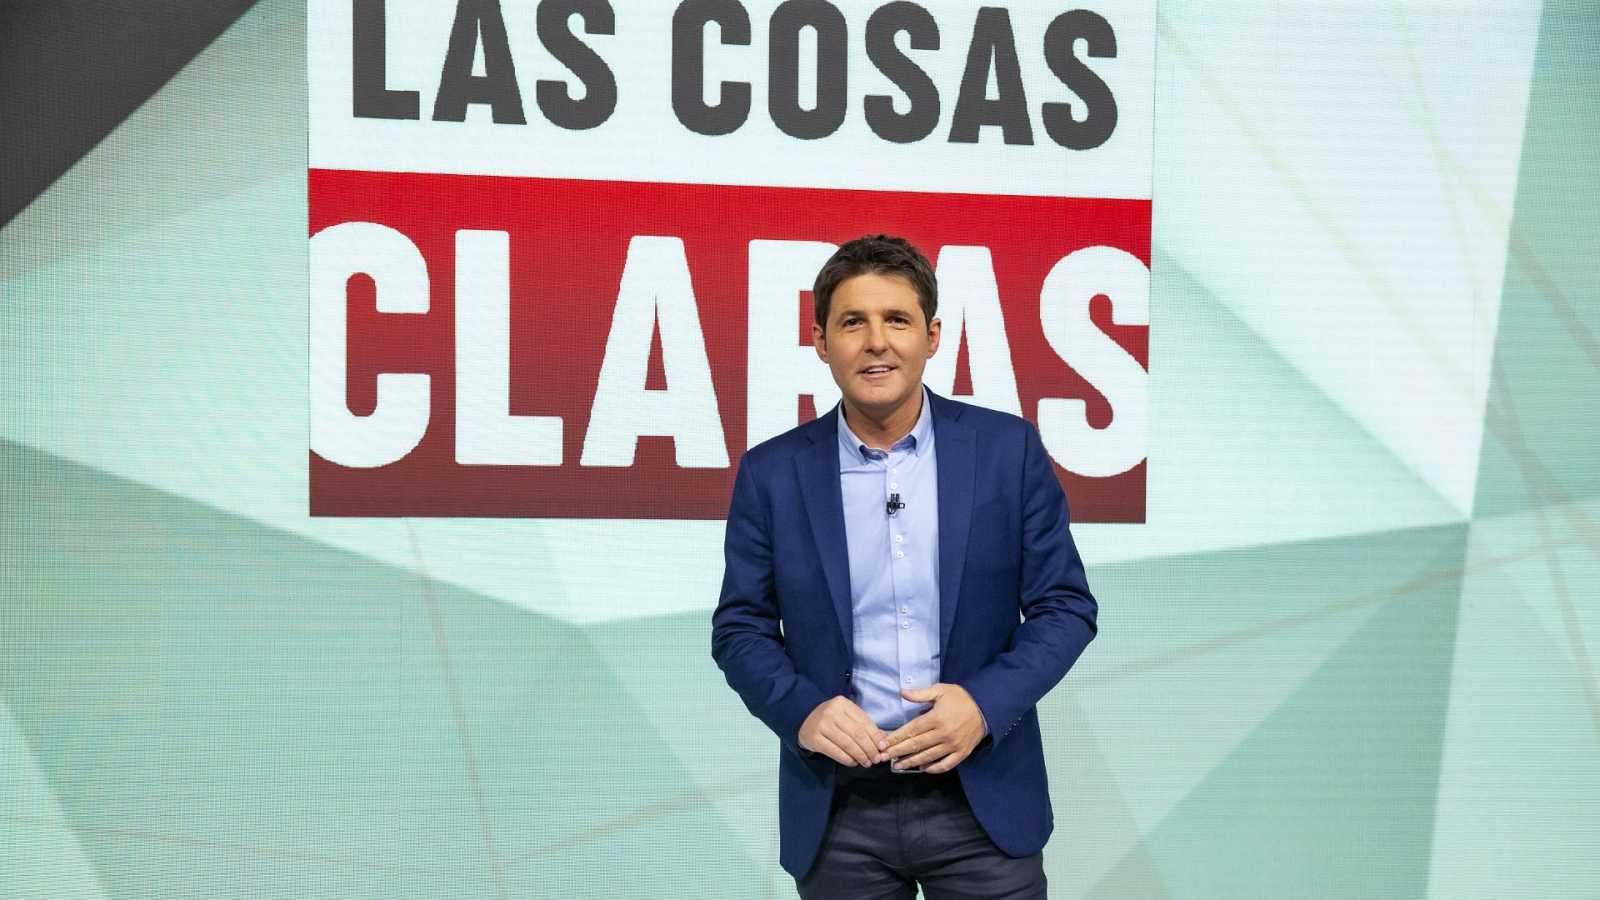 Cosas Claras VOX